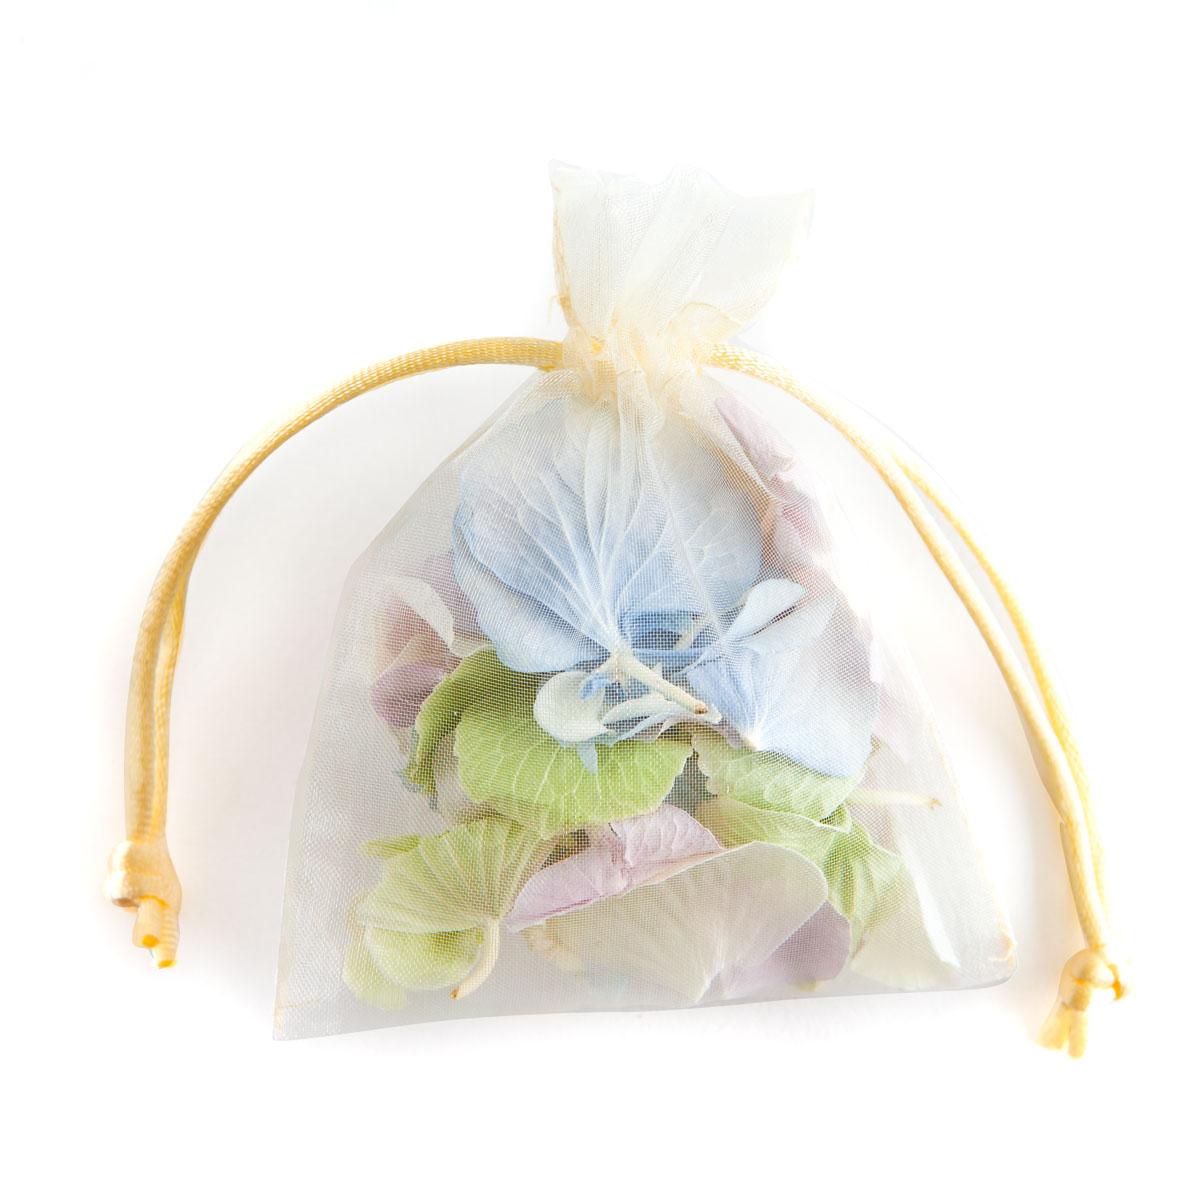 Petal Bag of Hydrangea Petal Confetti